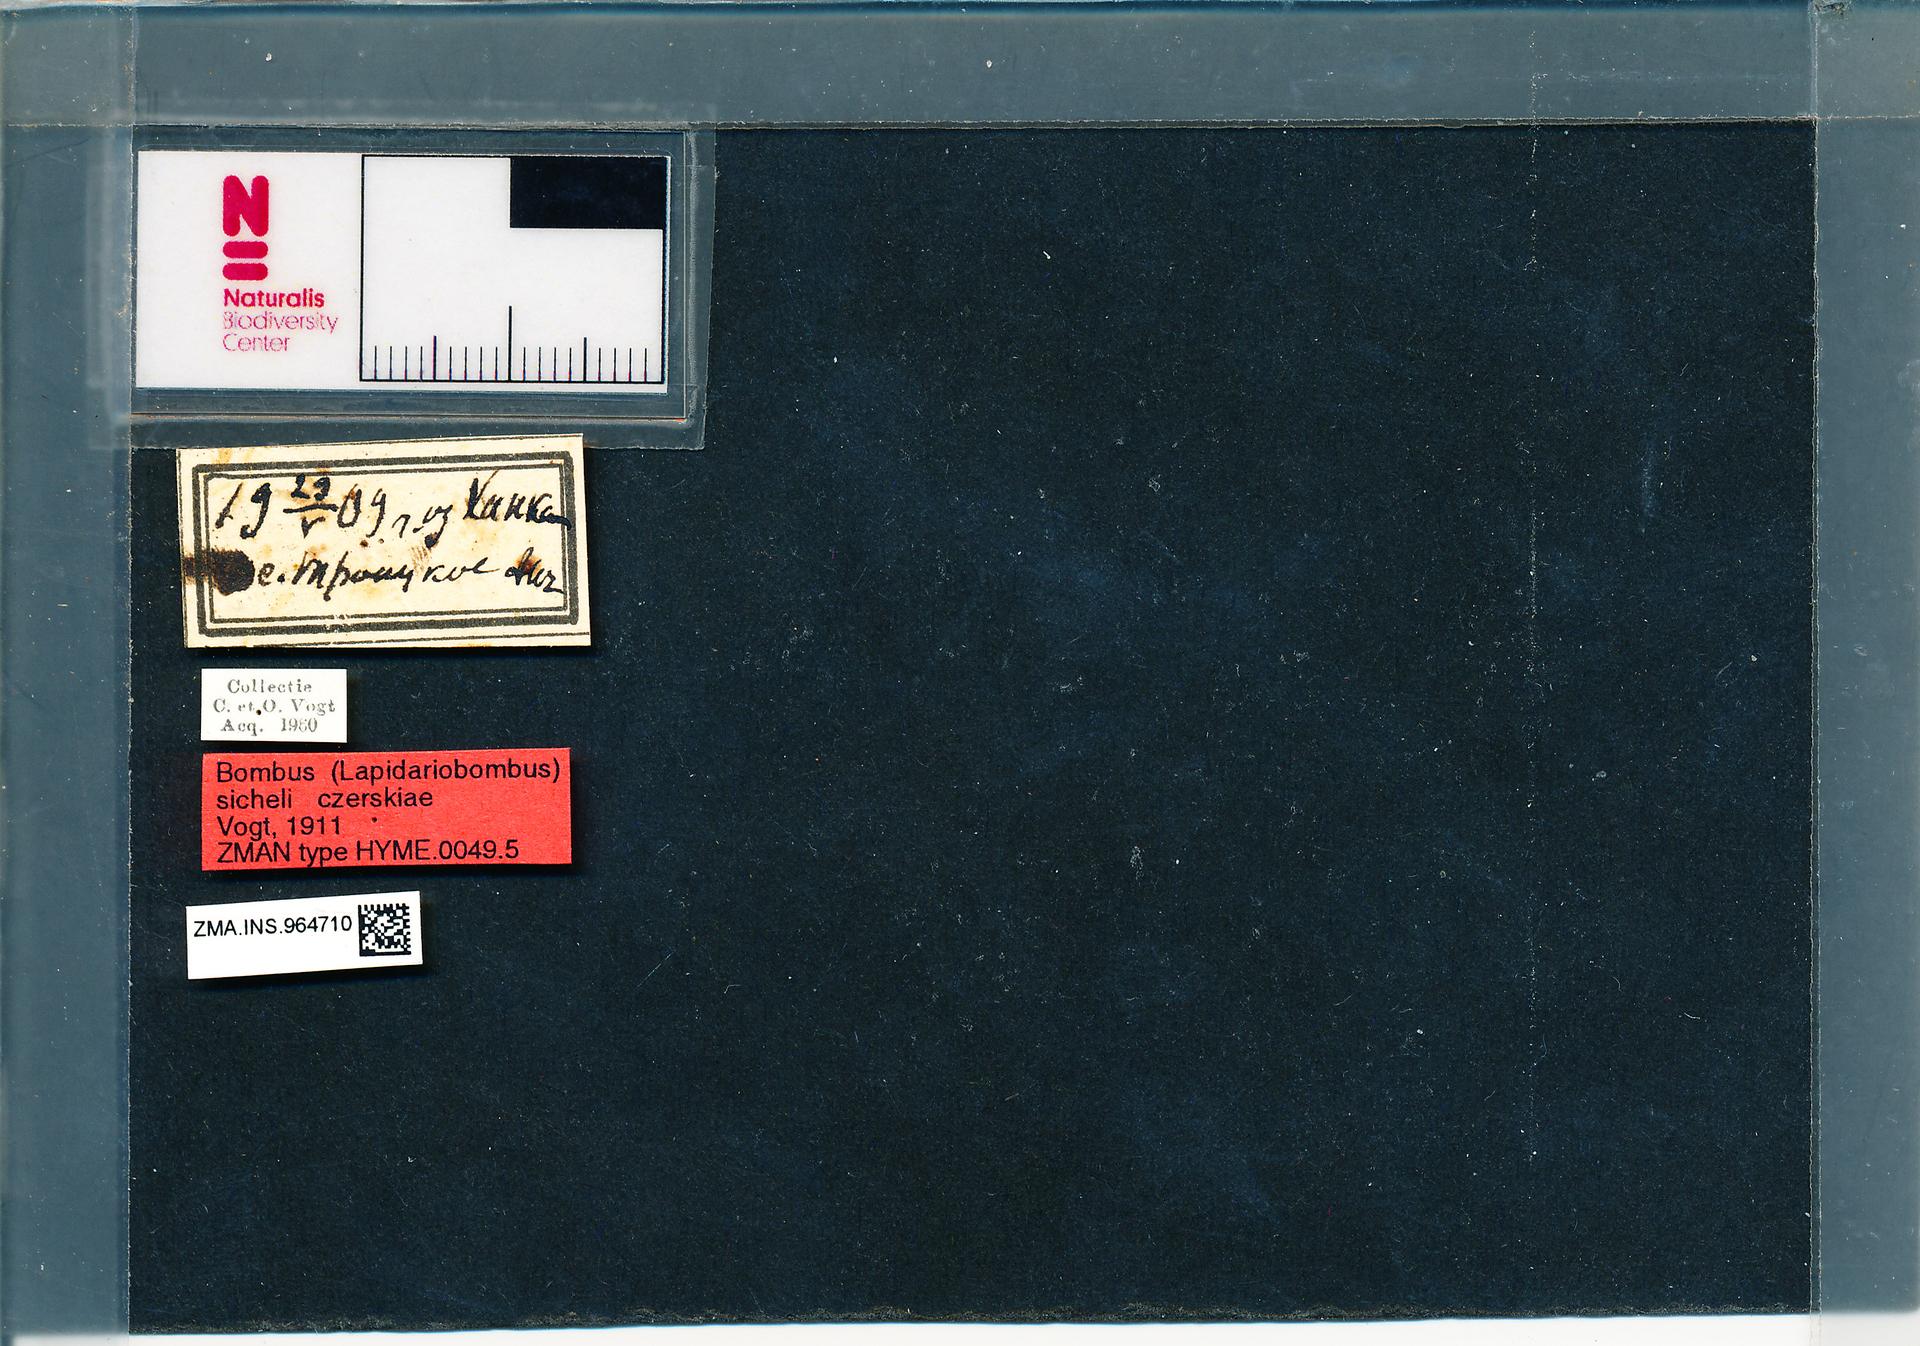 ZMA.INS.964710 | Bombus (Melanobombus) sichelii uniens Vogt, 1911